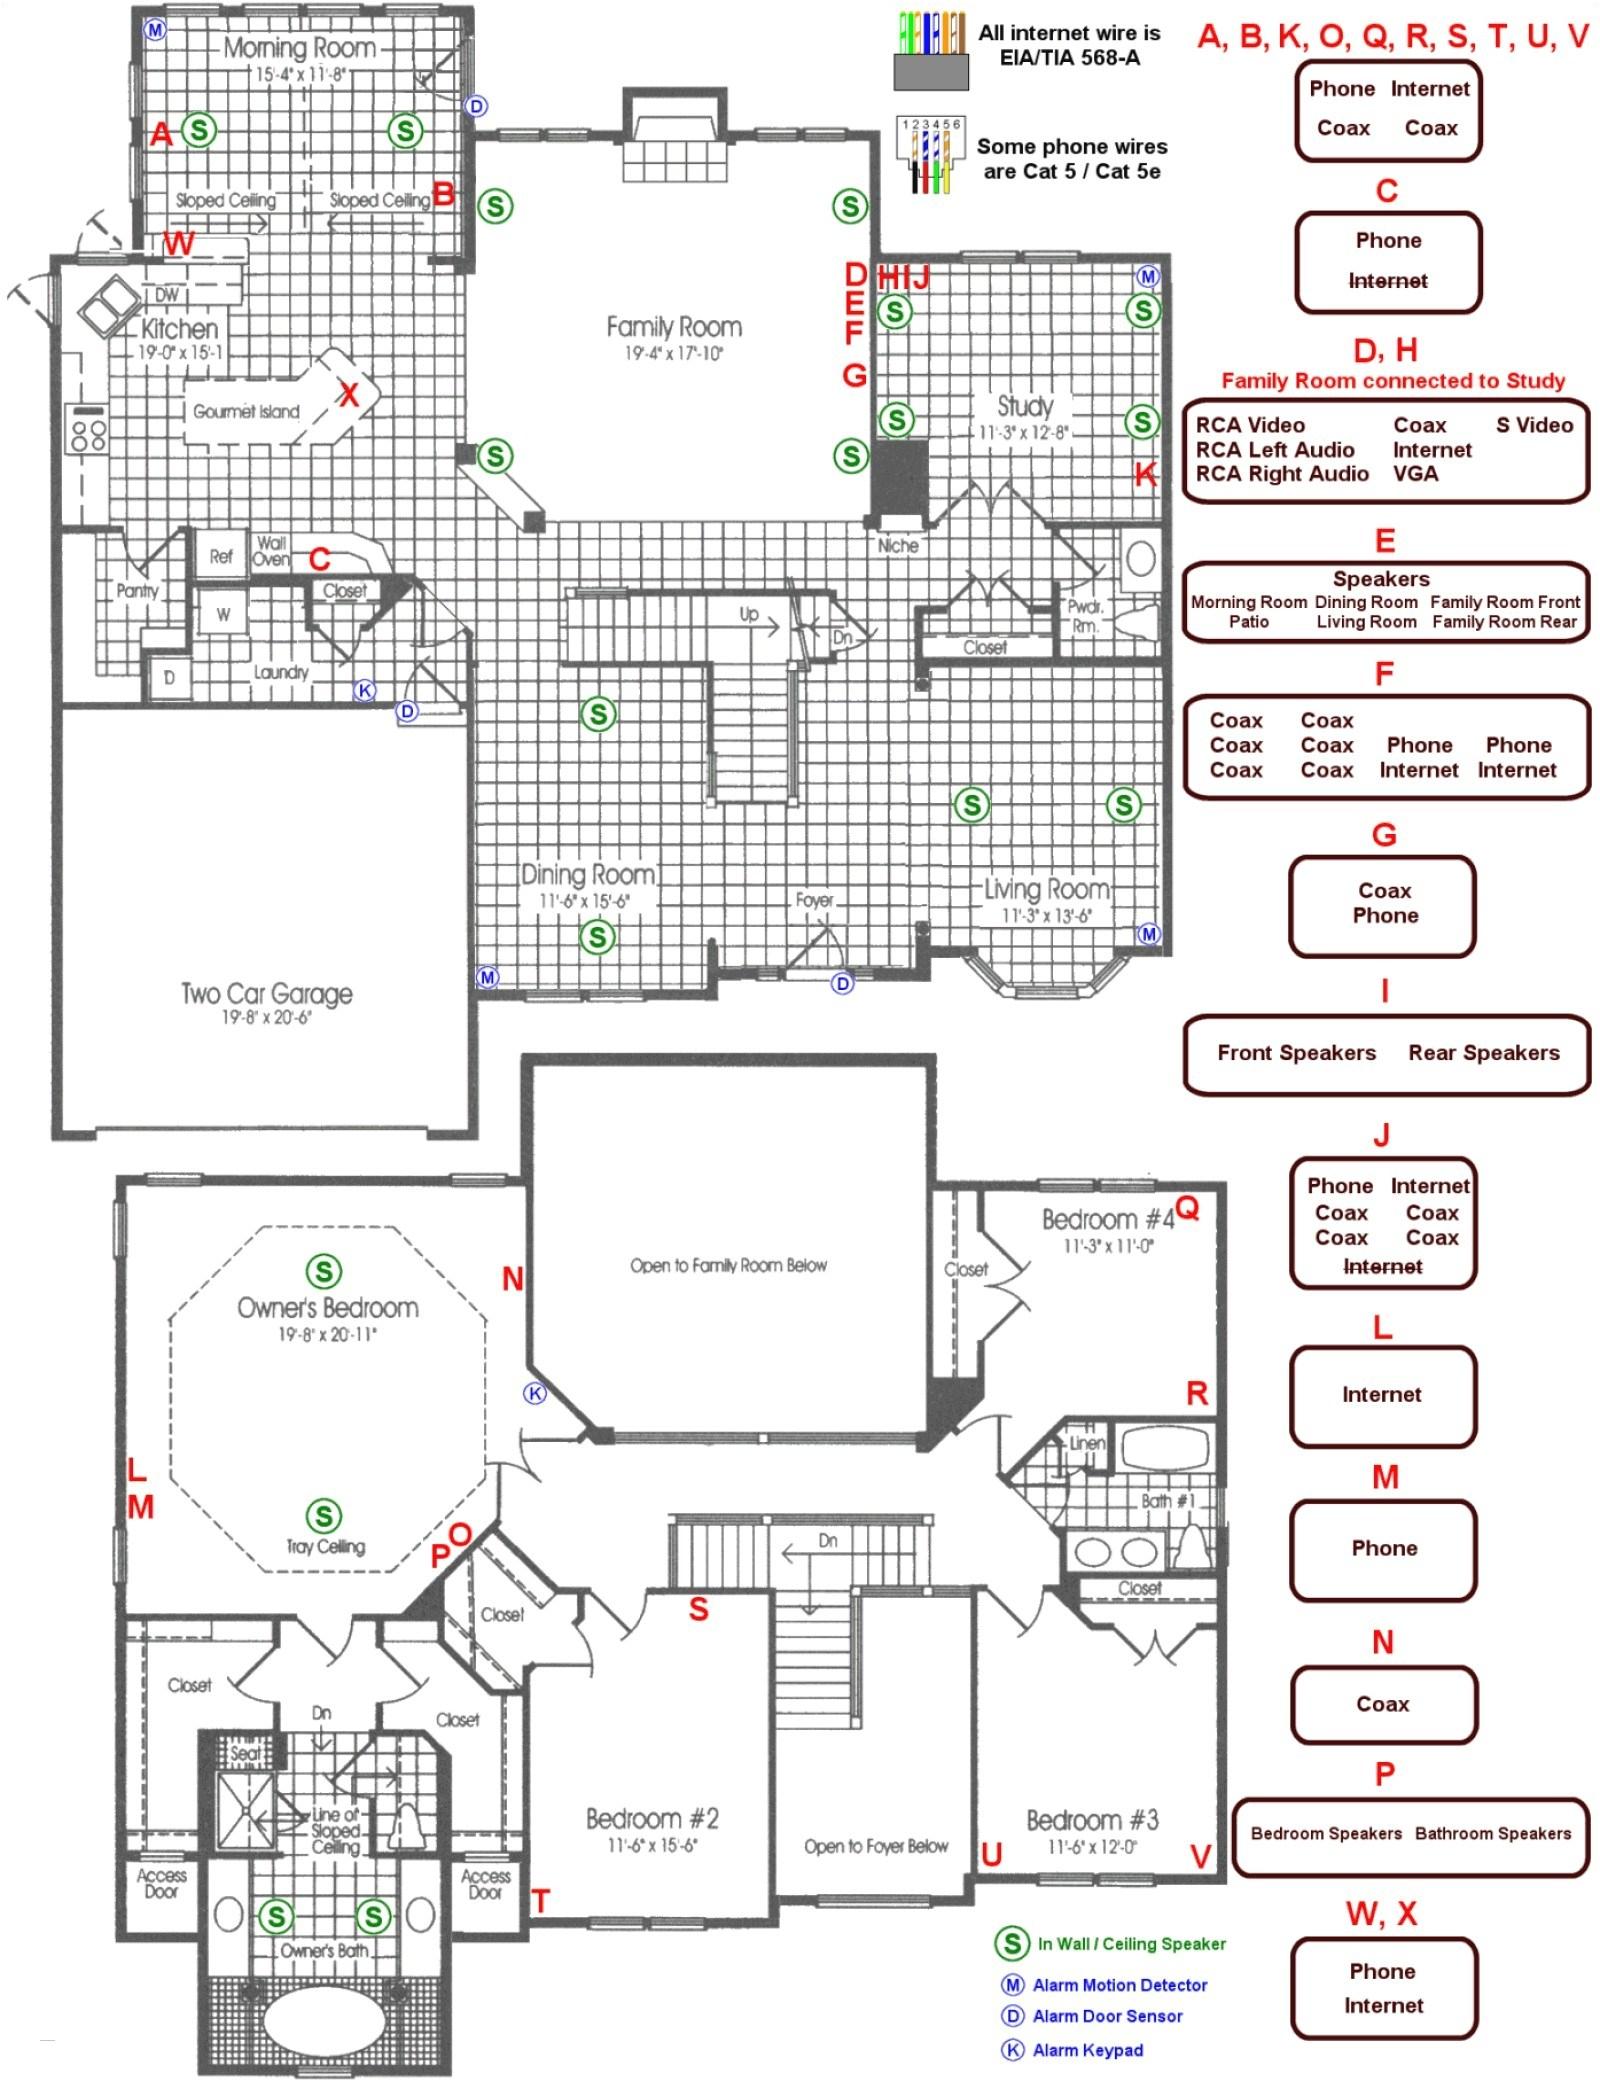 traffic light wiring to house wiring diagram blog mix traffic light signal controller wiring diagrams wiring